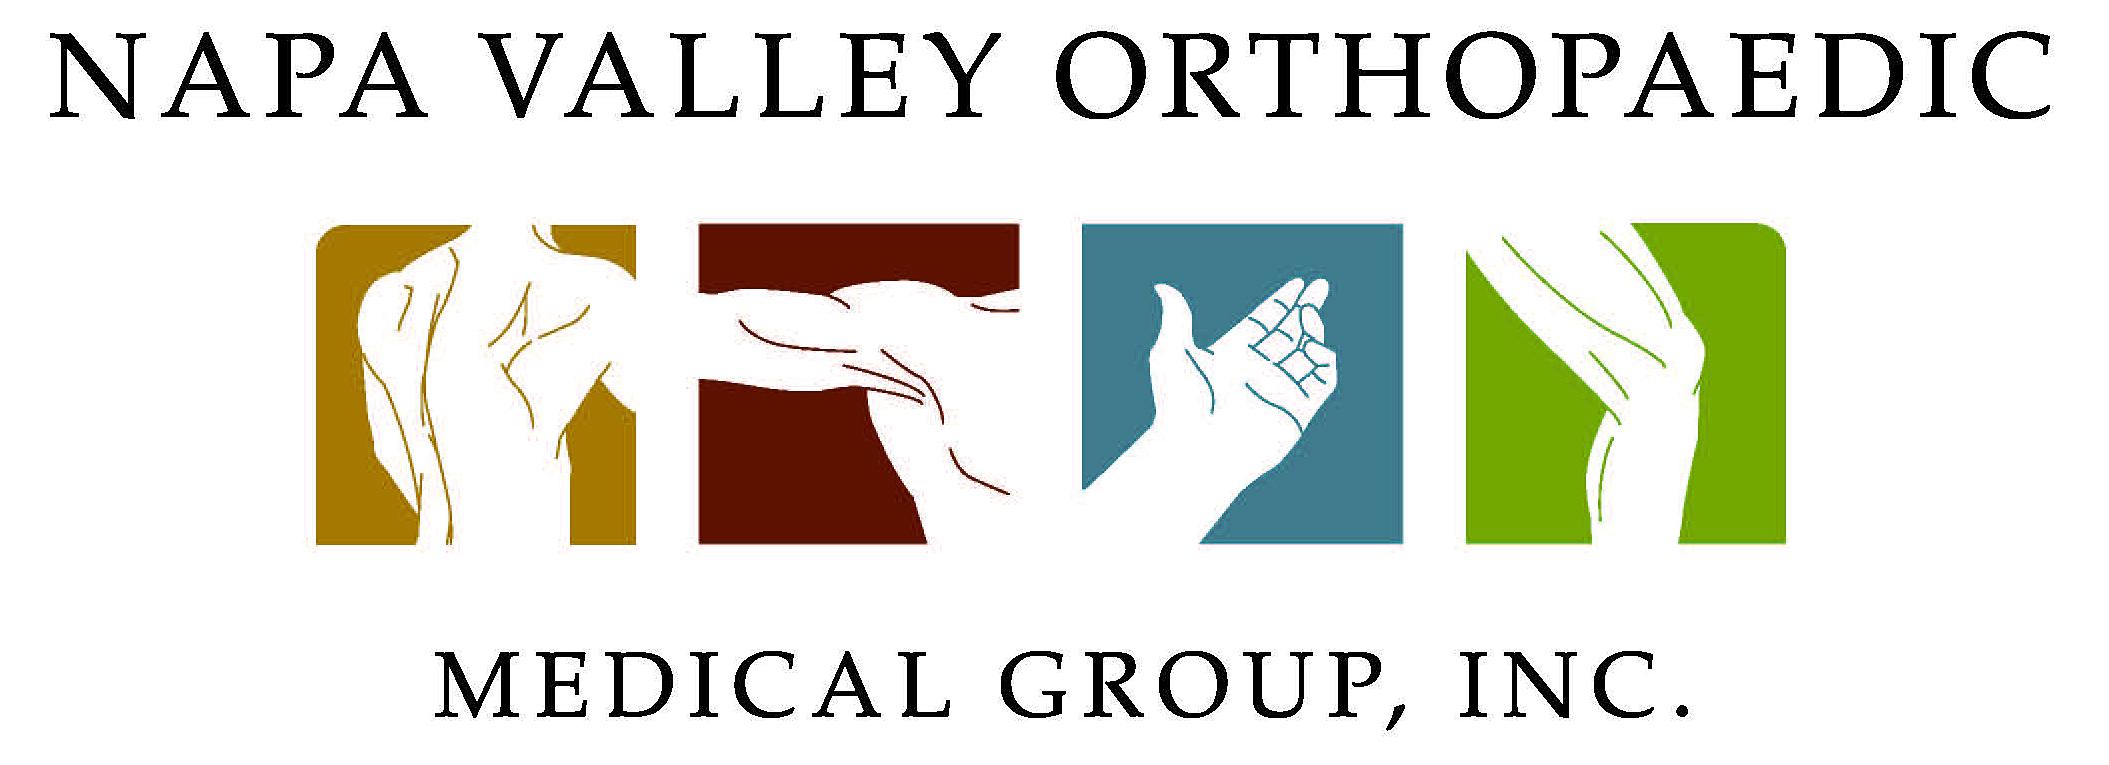 Napa Valley Orthopaedic